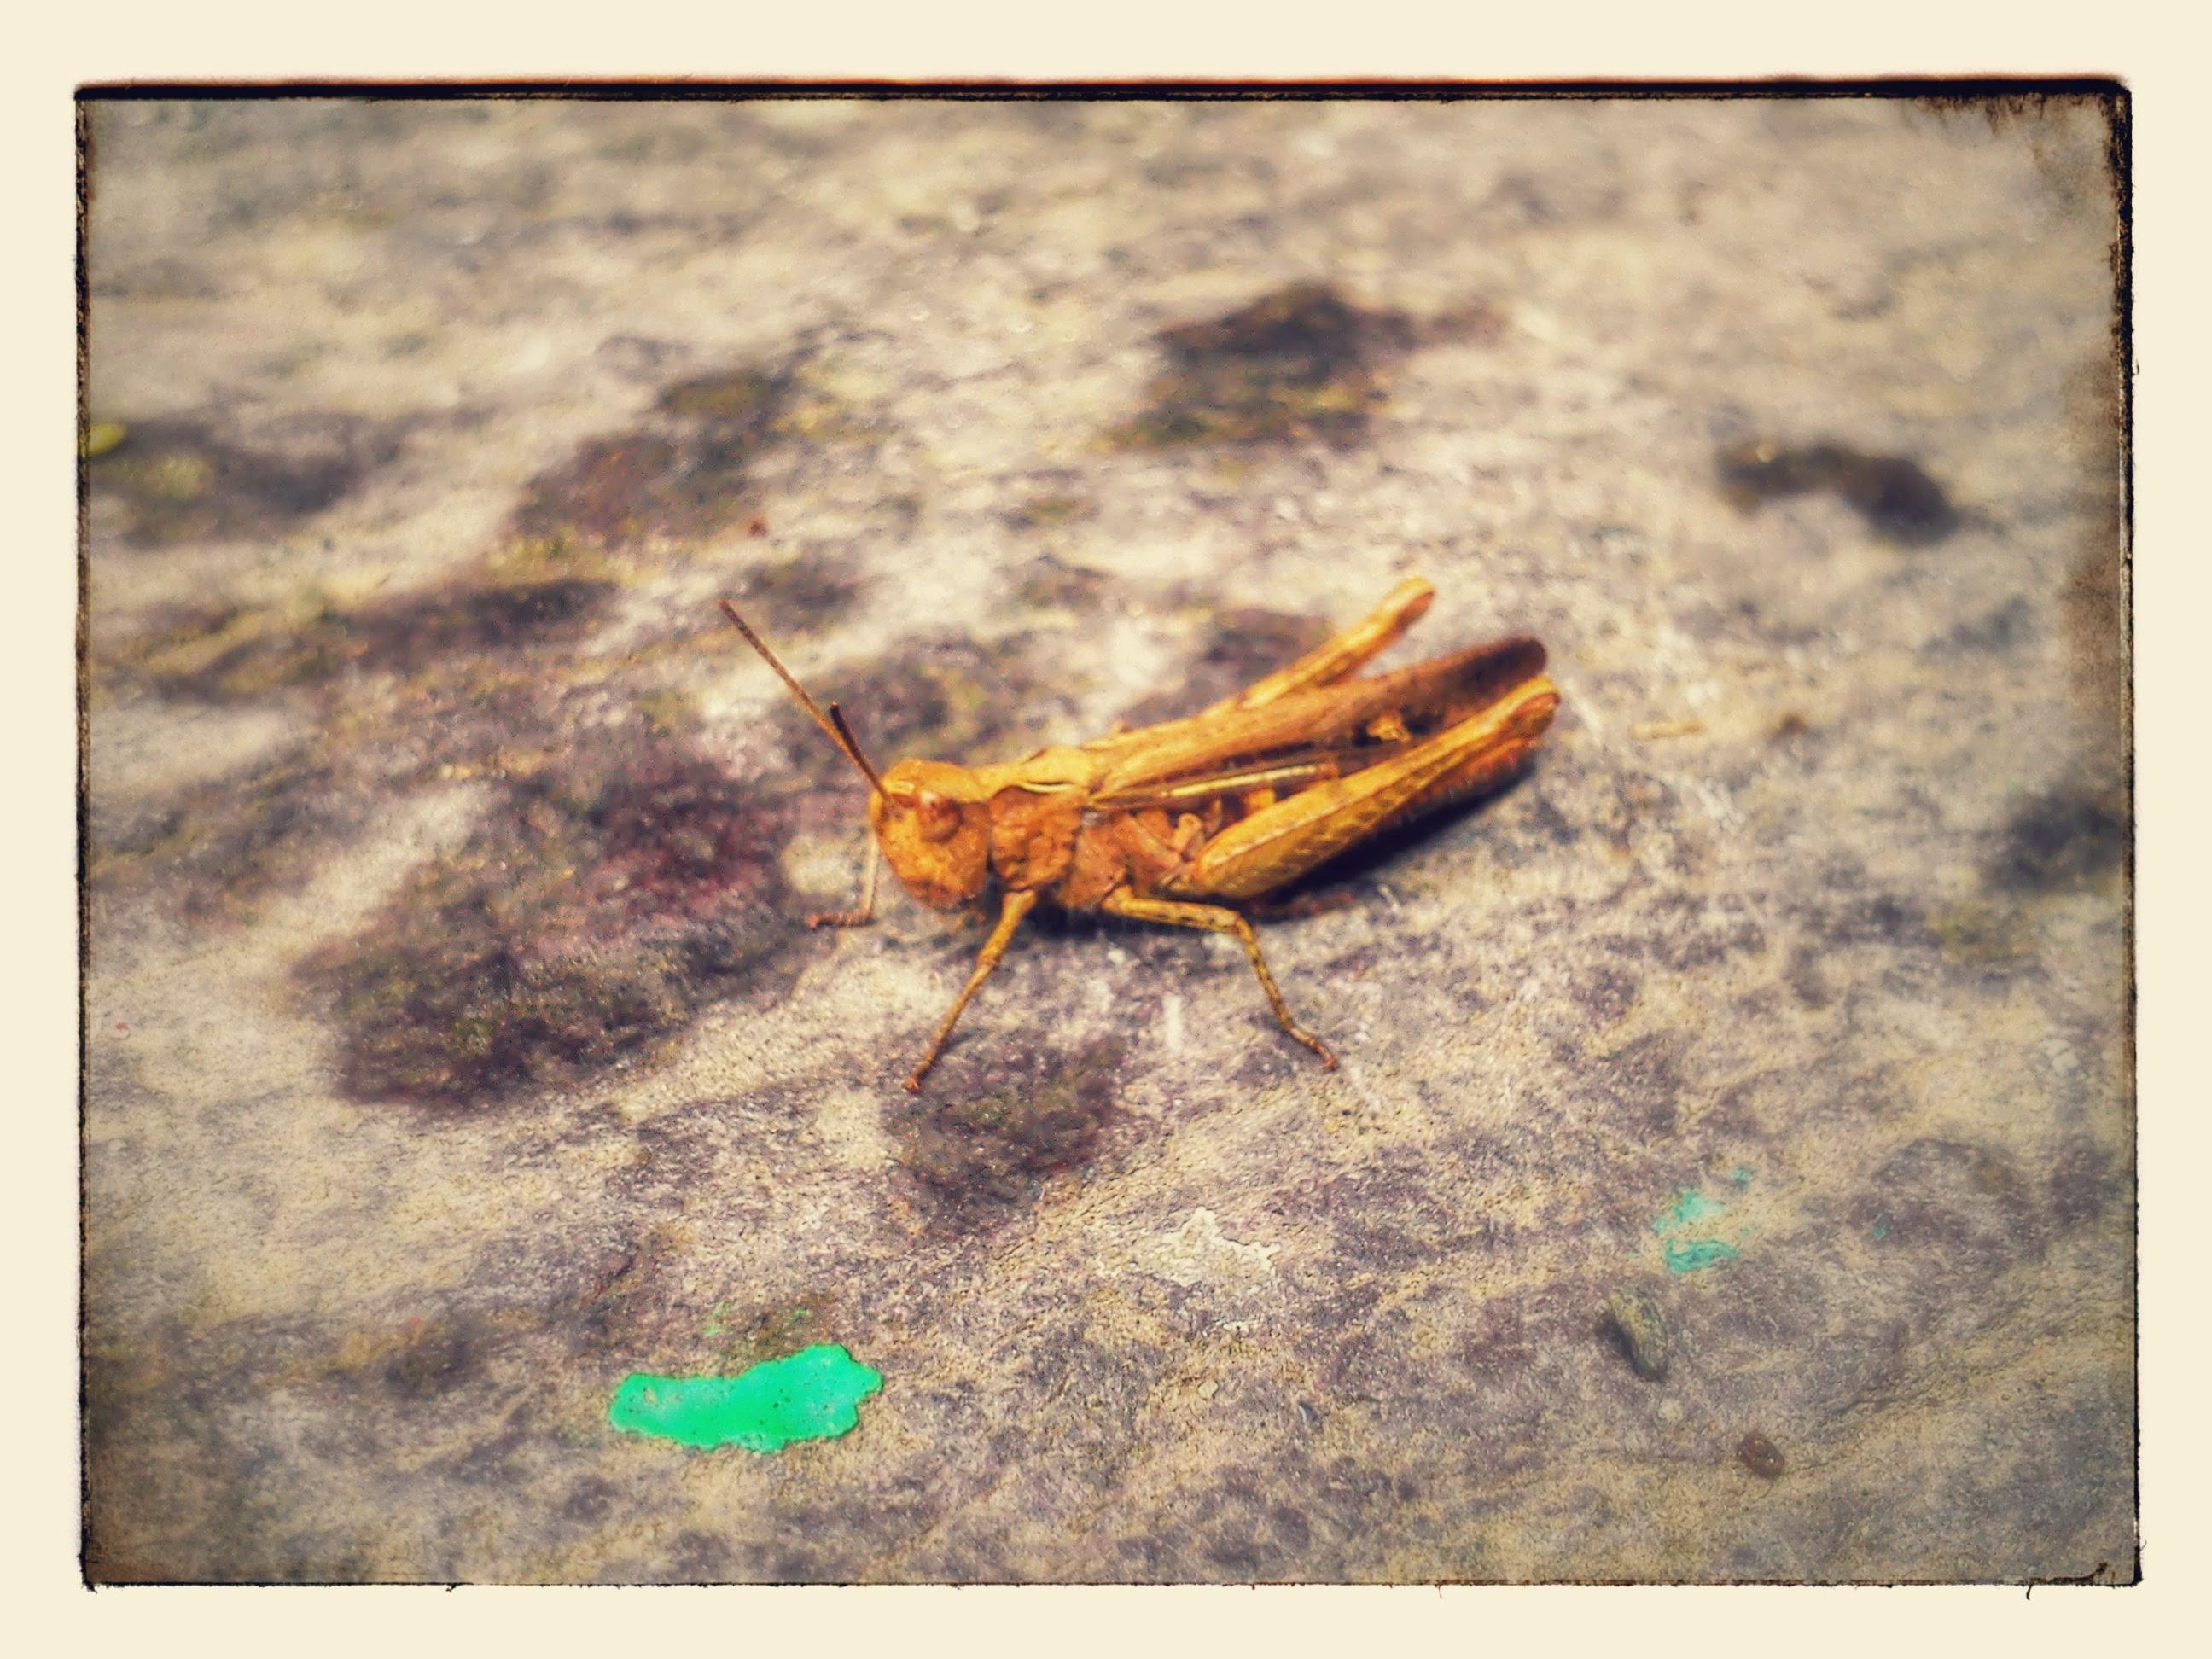 Grasshopper on doorstep.